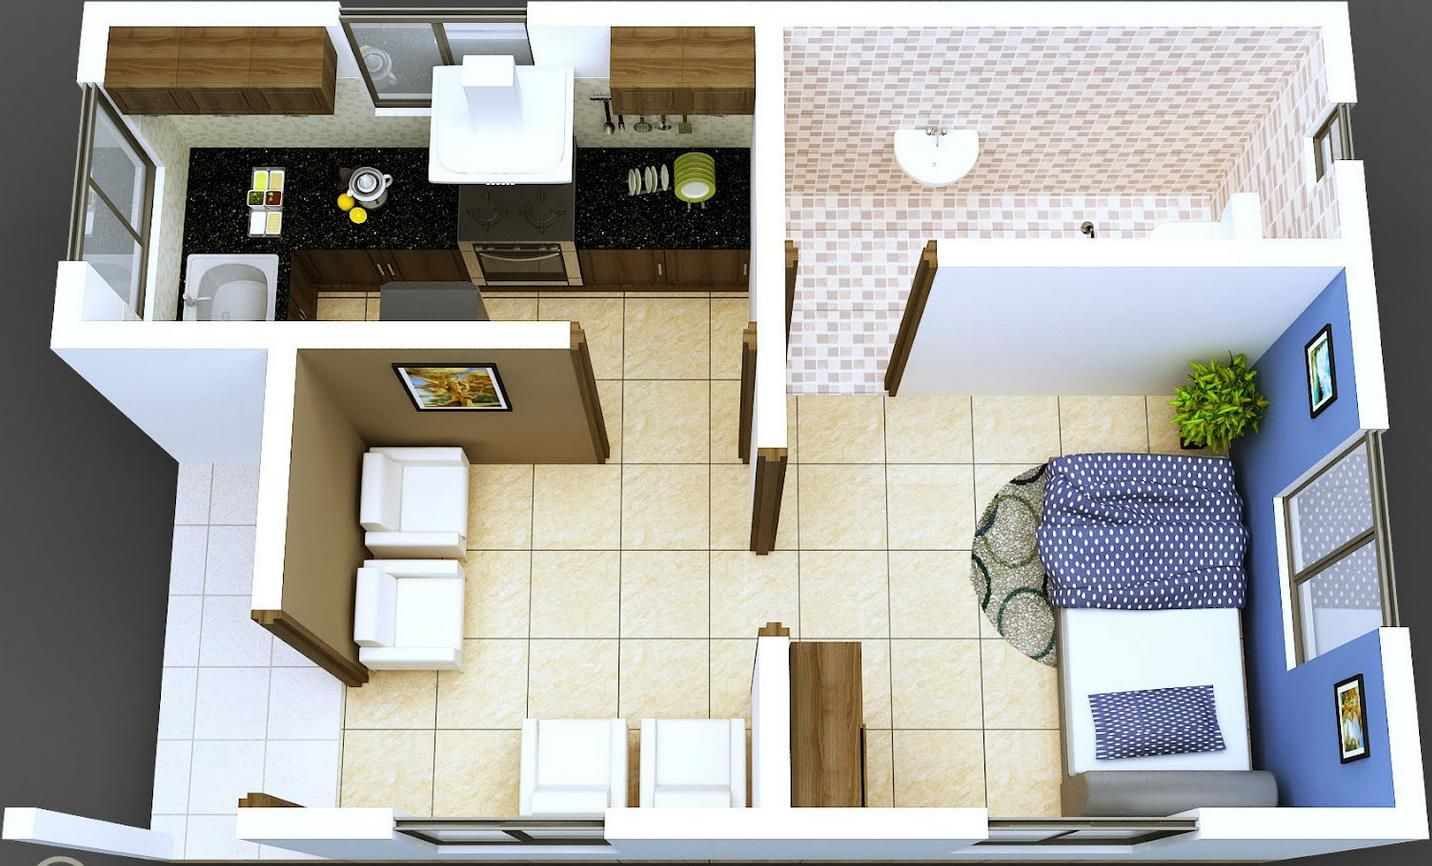 Plano moderno de departamento en 50 metros cuadrados for Apartamentos pequenos planos